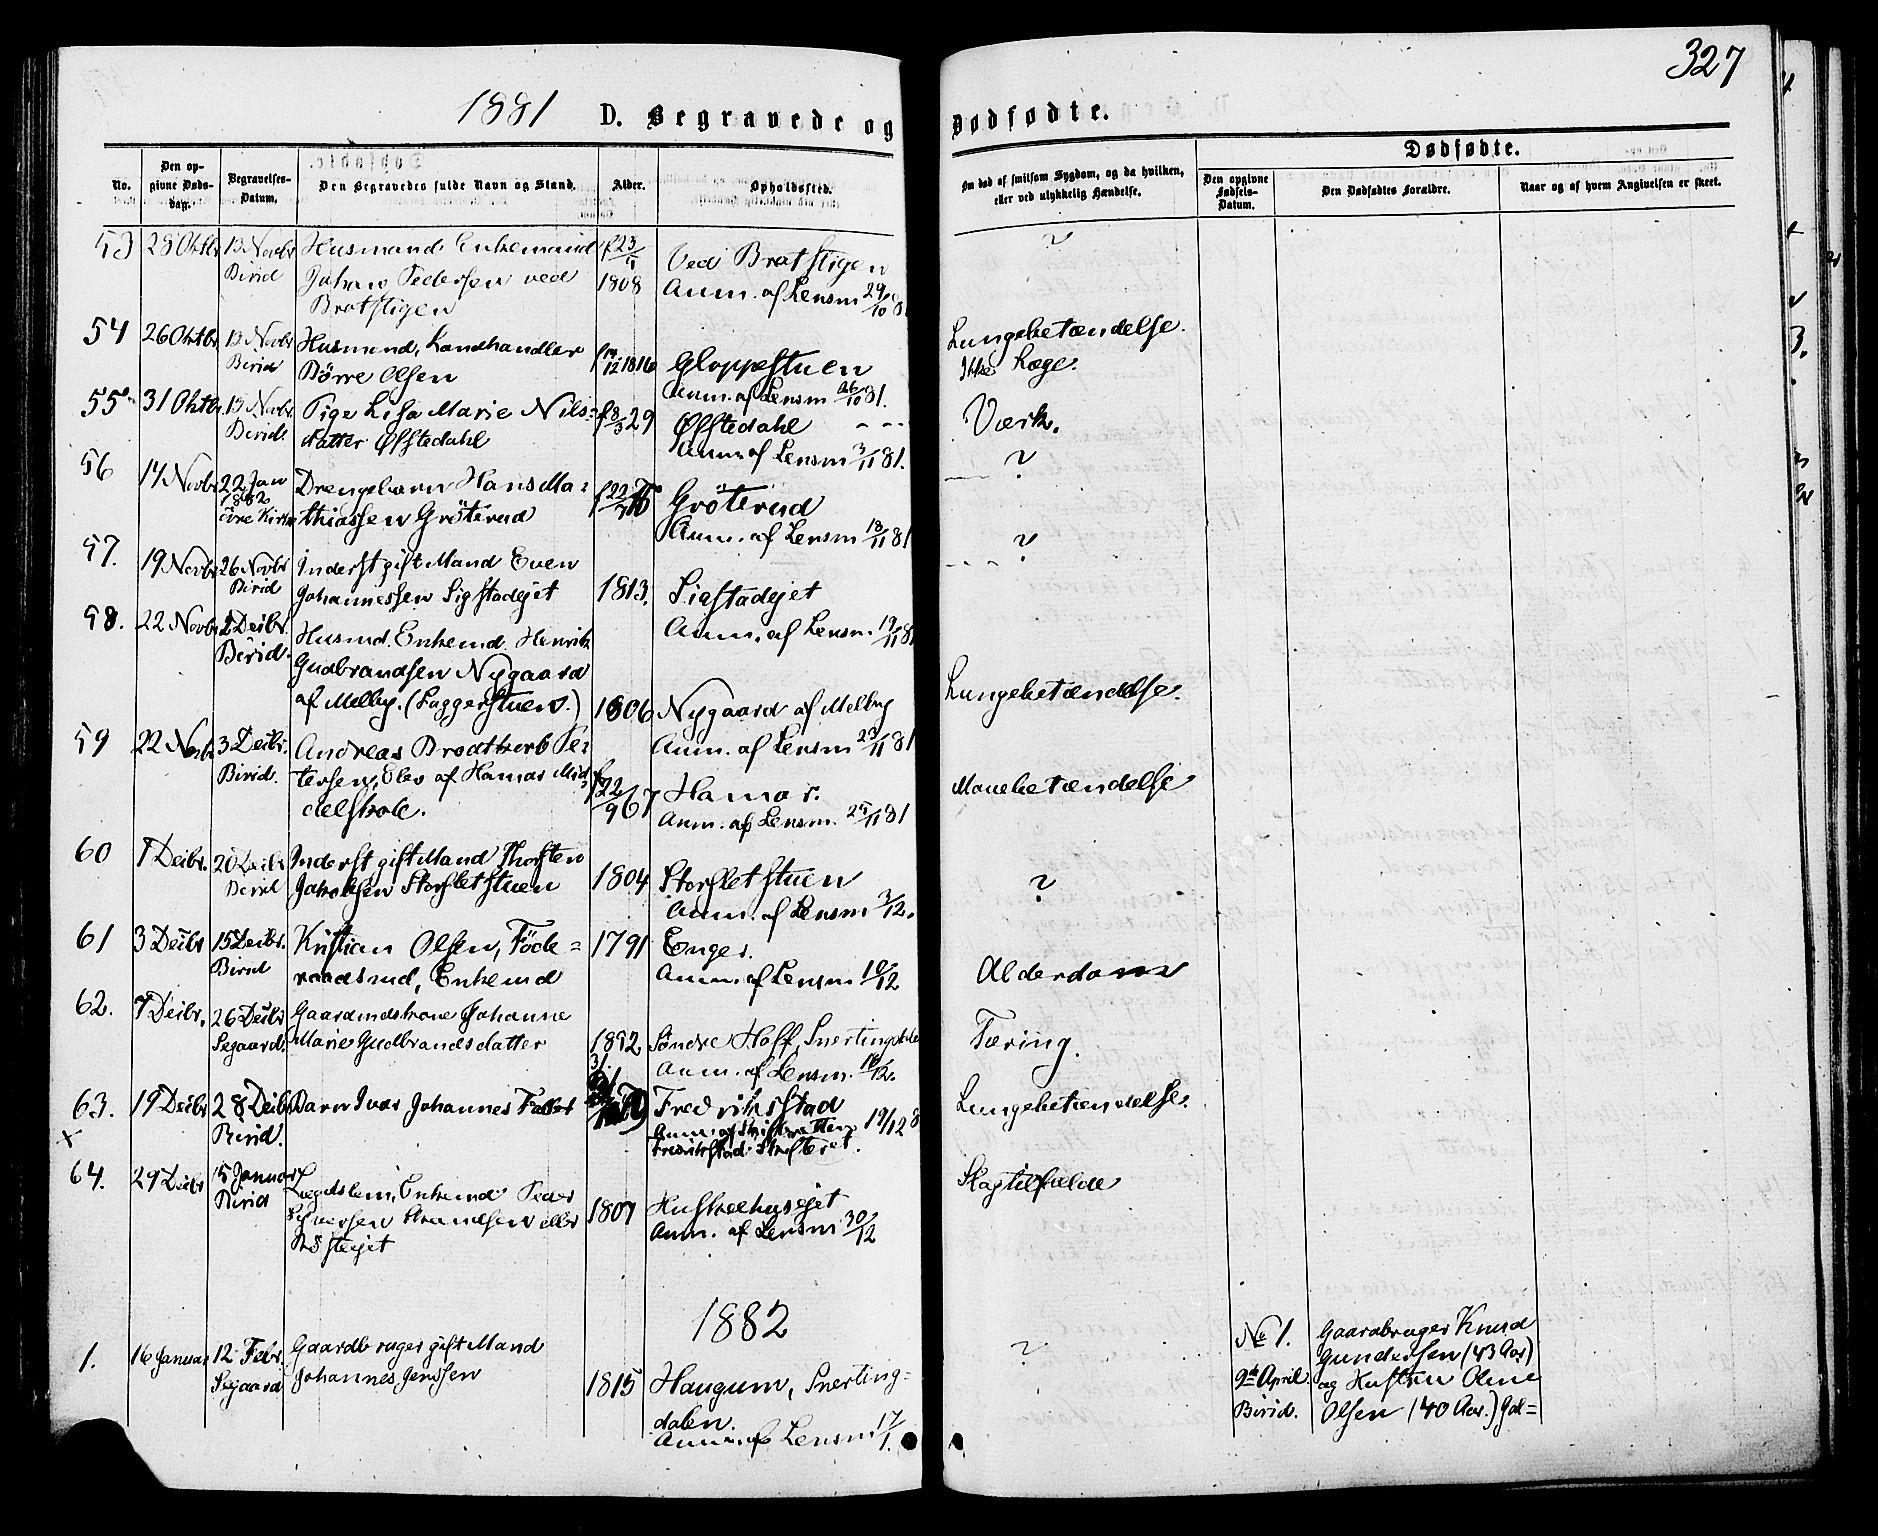 SAH, Biri prestekontor, Ministerialbok nr. 6, 1877-1886, s. 327